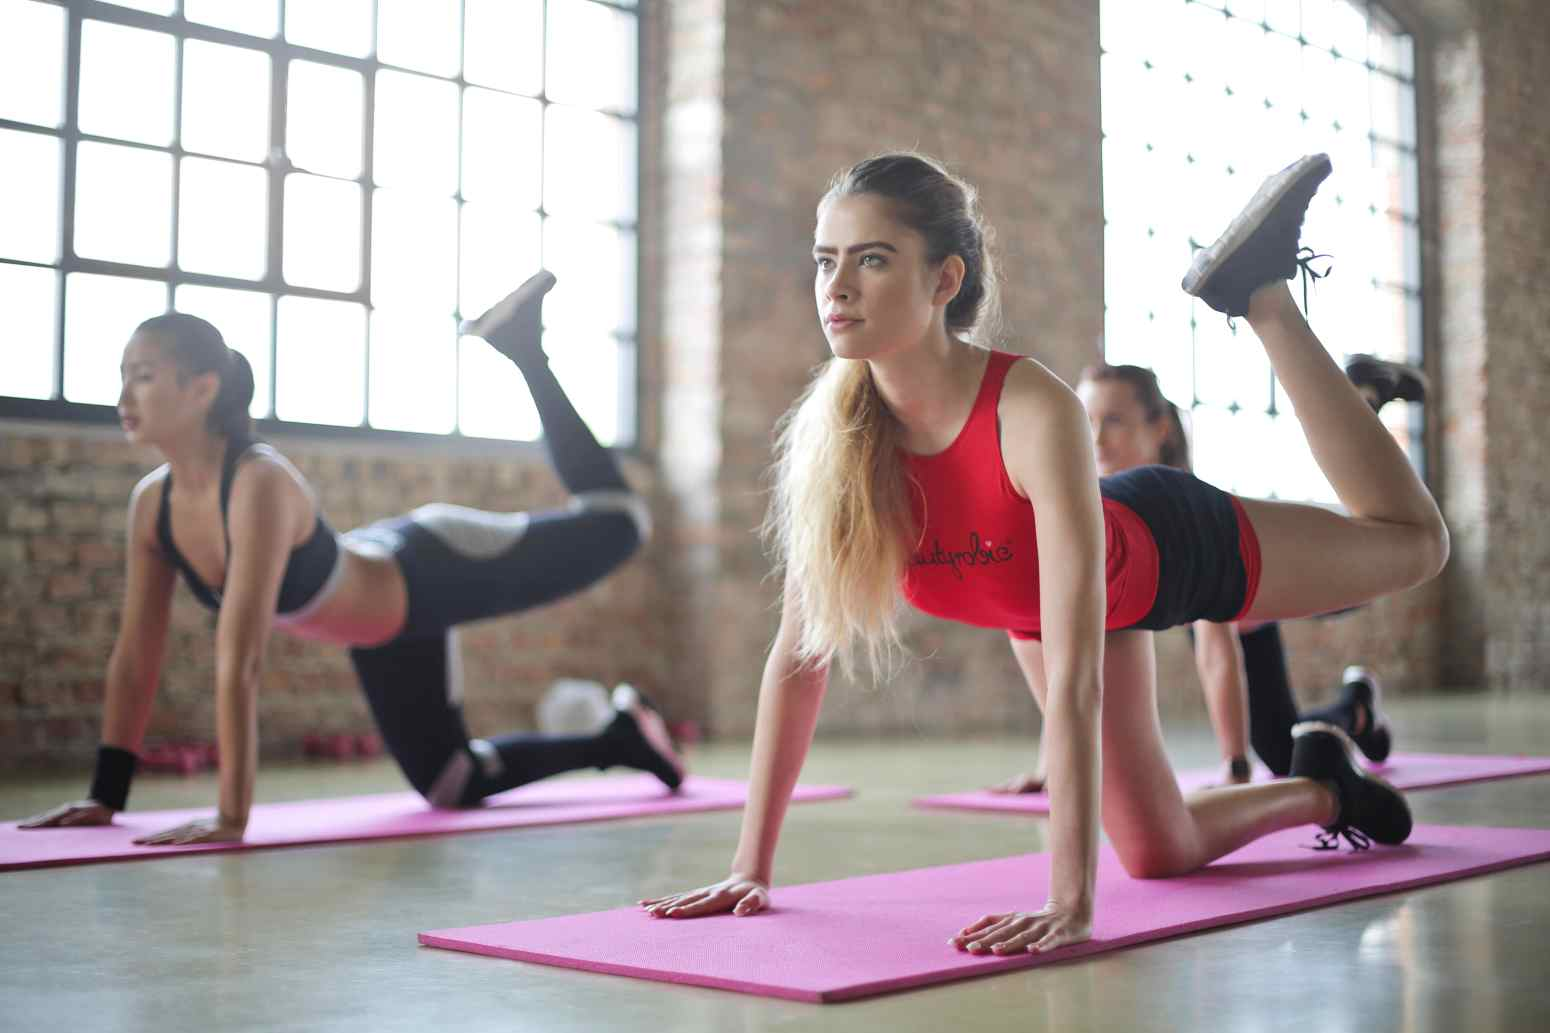 10 Reasons to Go On Yoga Retreats